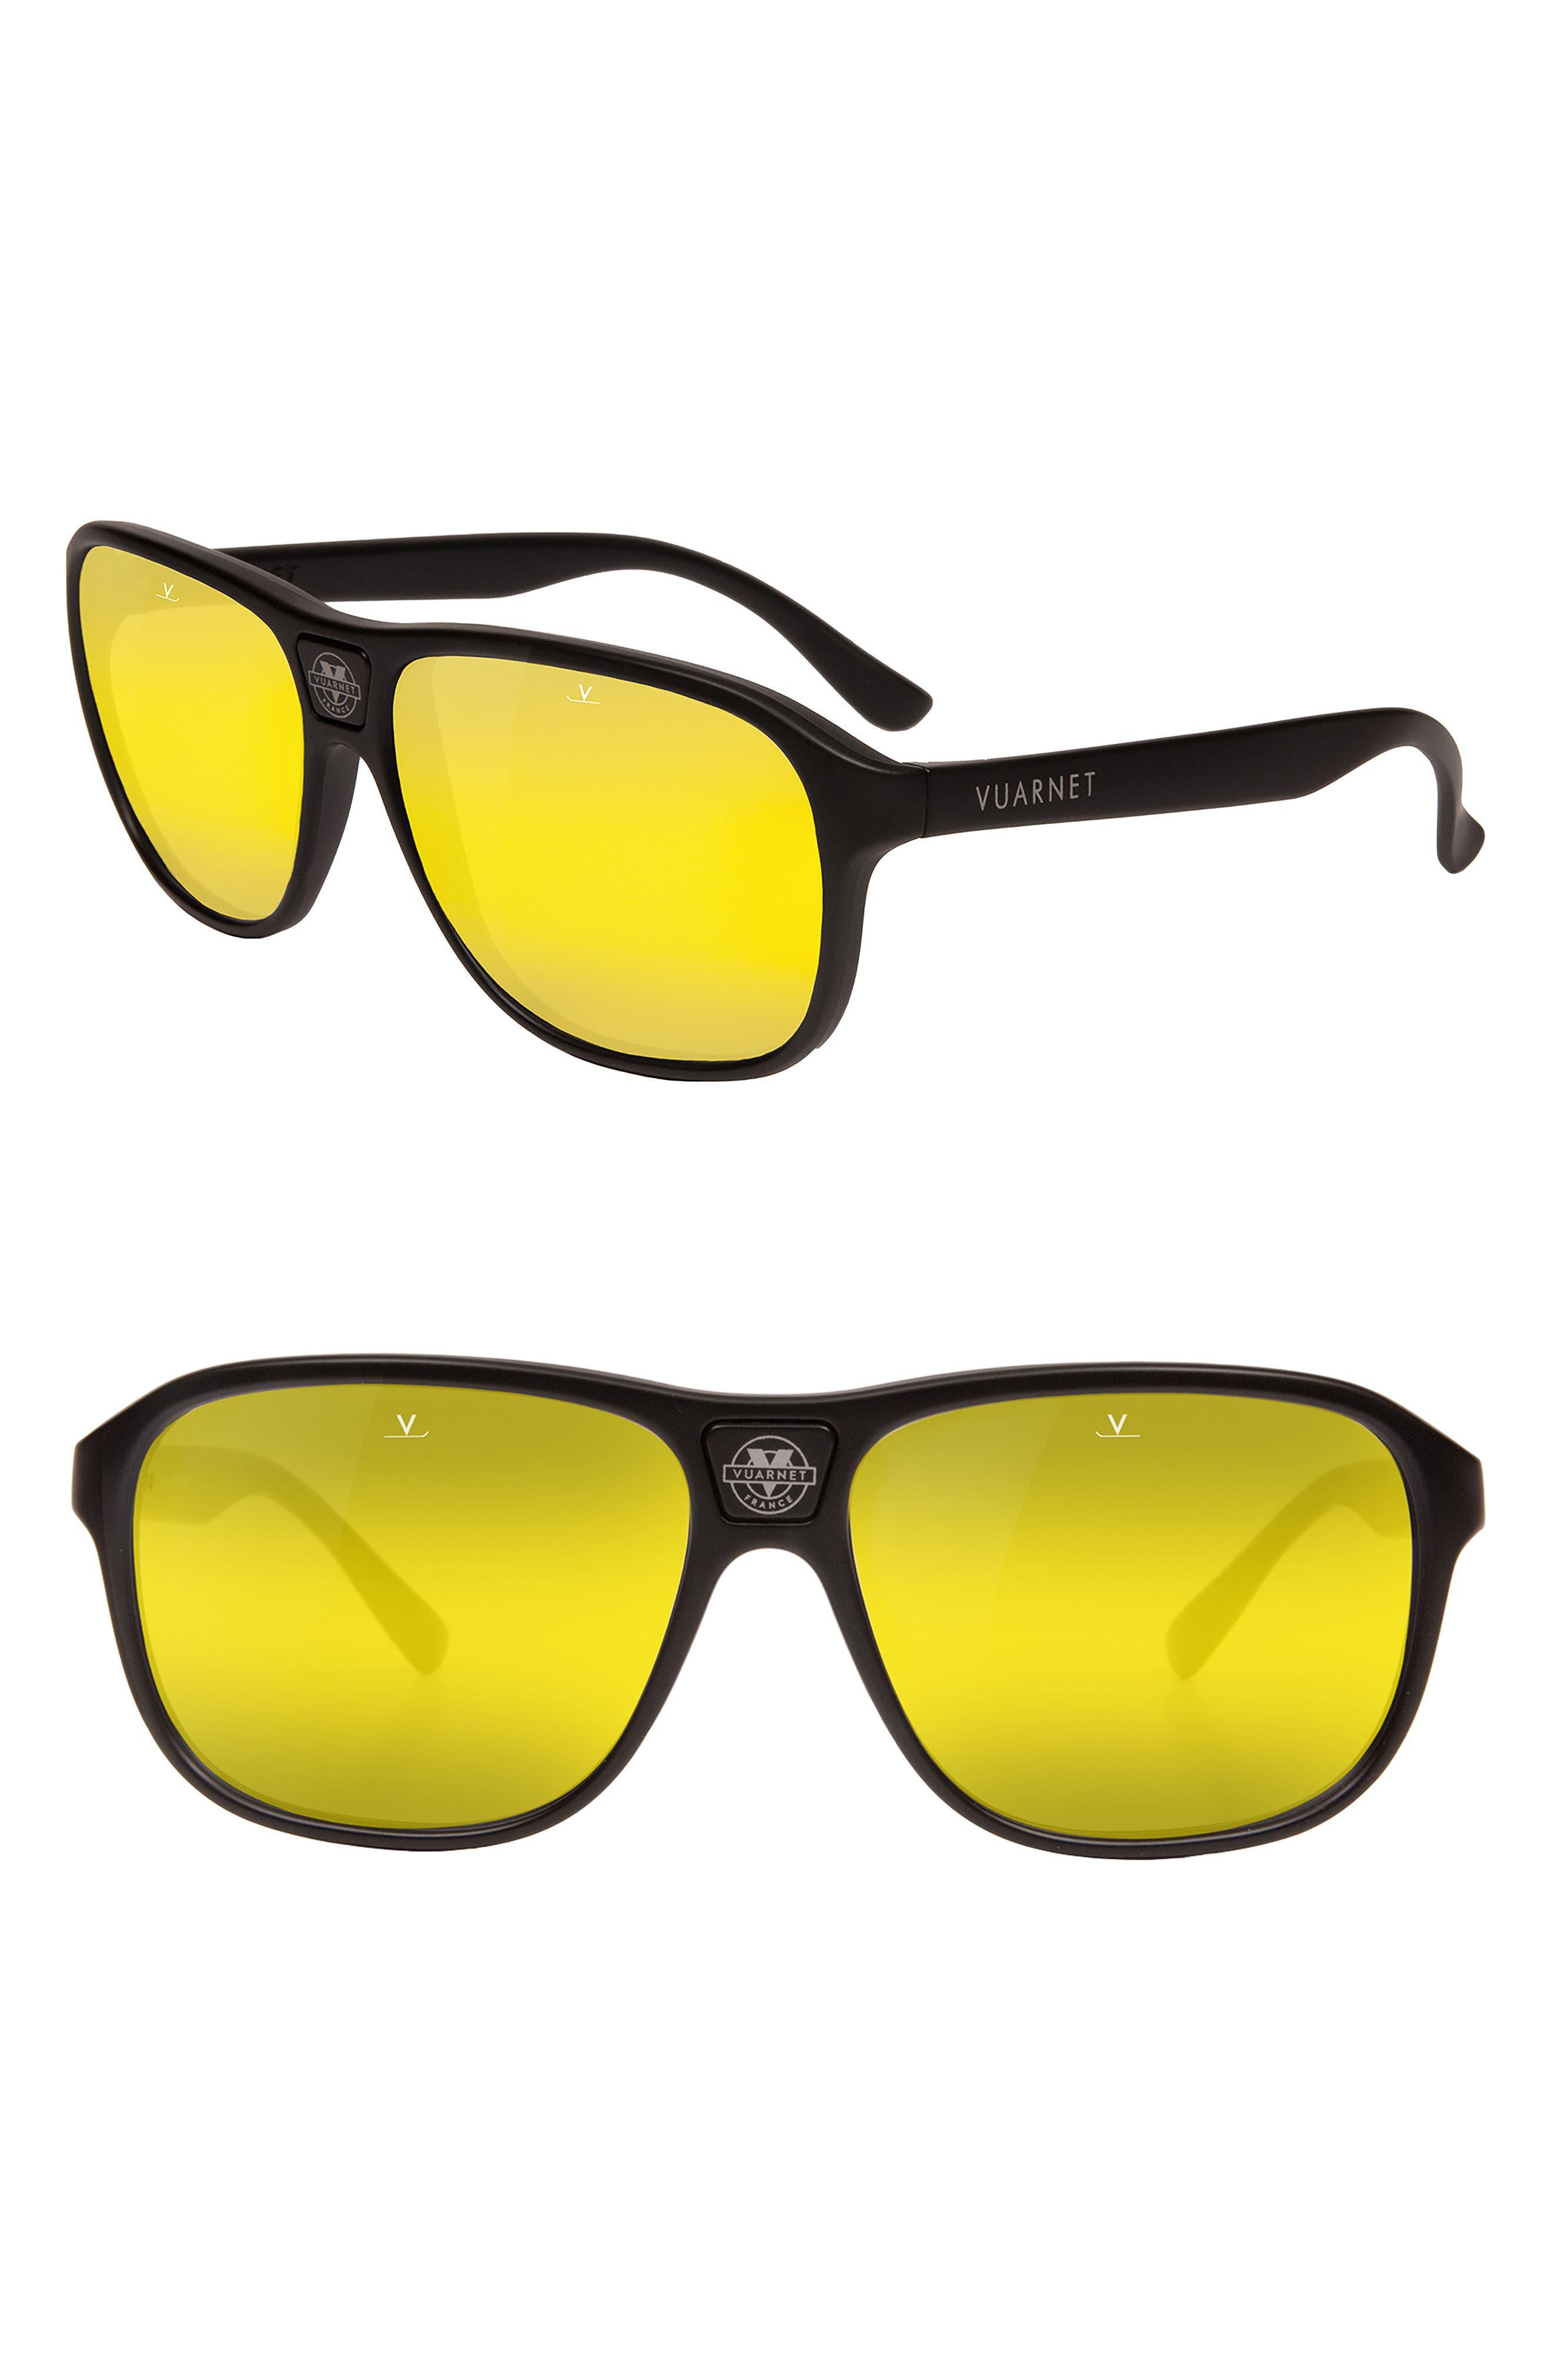 Legends 03 56mm Sunglasses,                             Main thumbnail 1, color,                             NIGHTLYNX